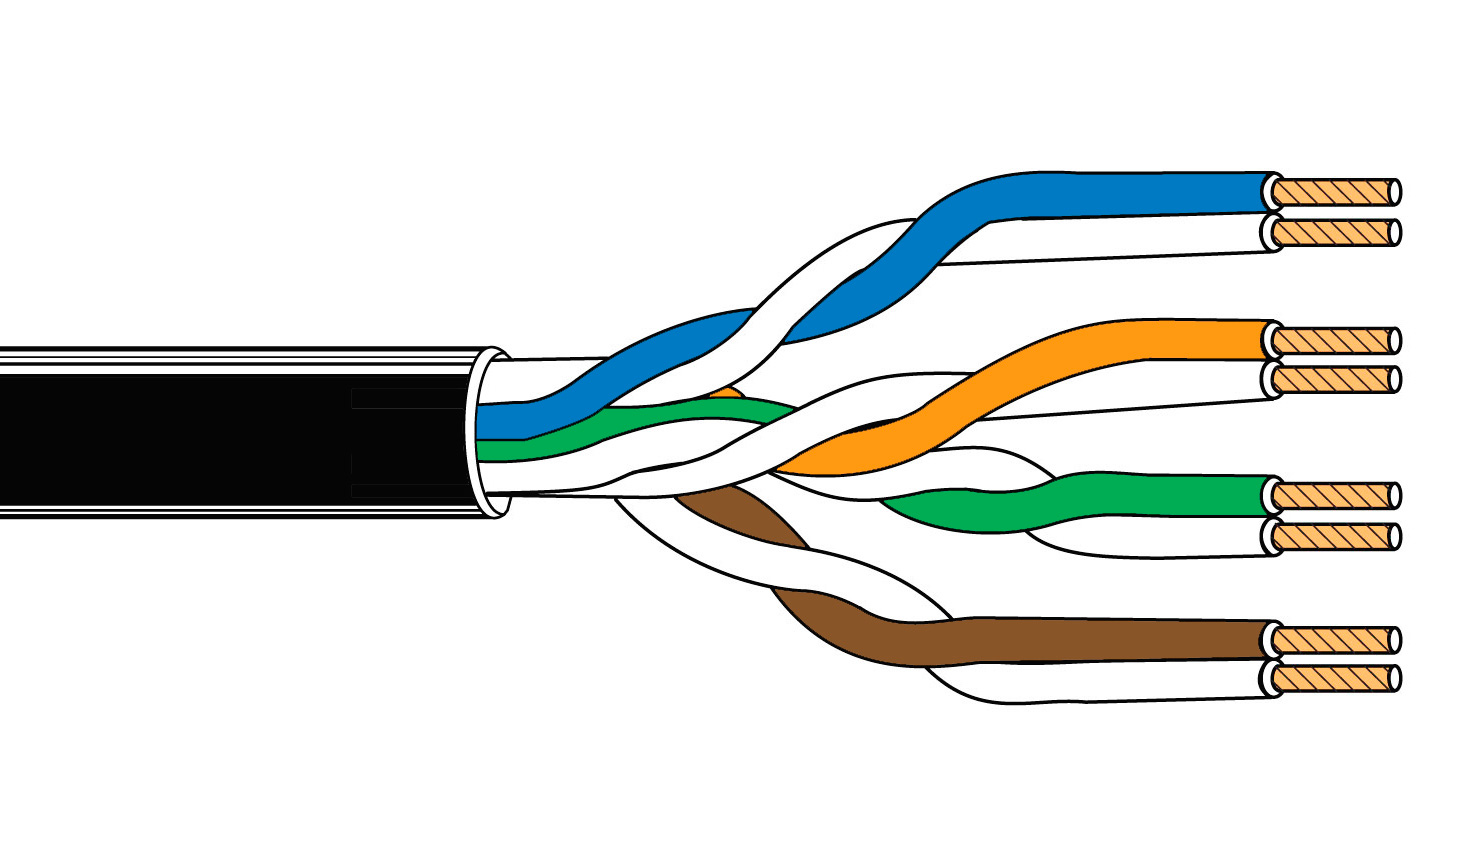 провод пугв 1х16.0 кв мм желто-зеленый